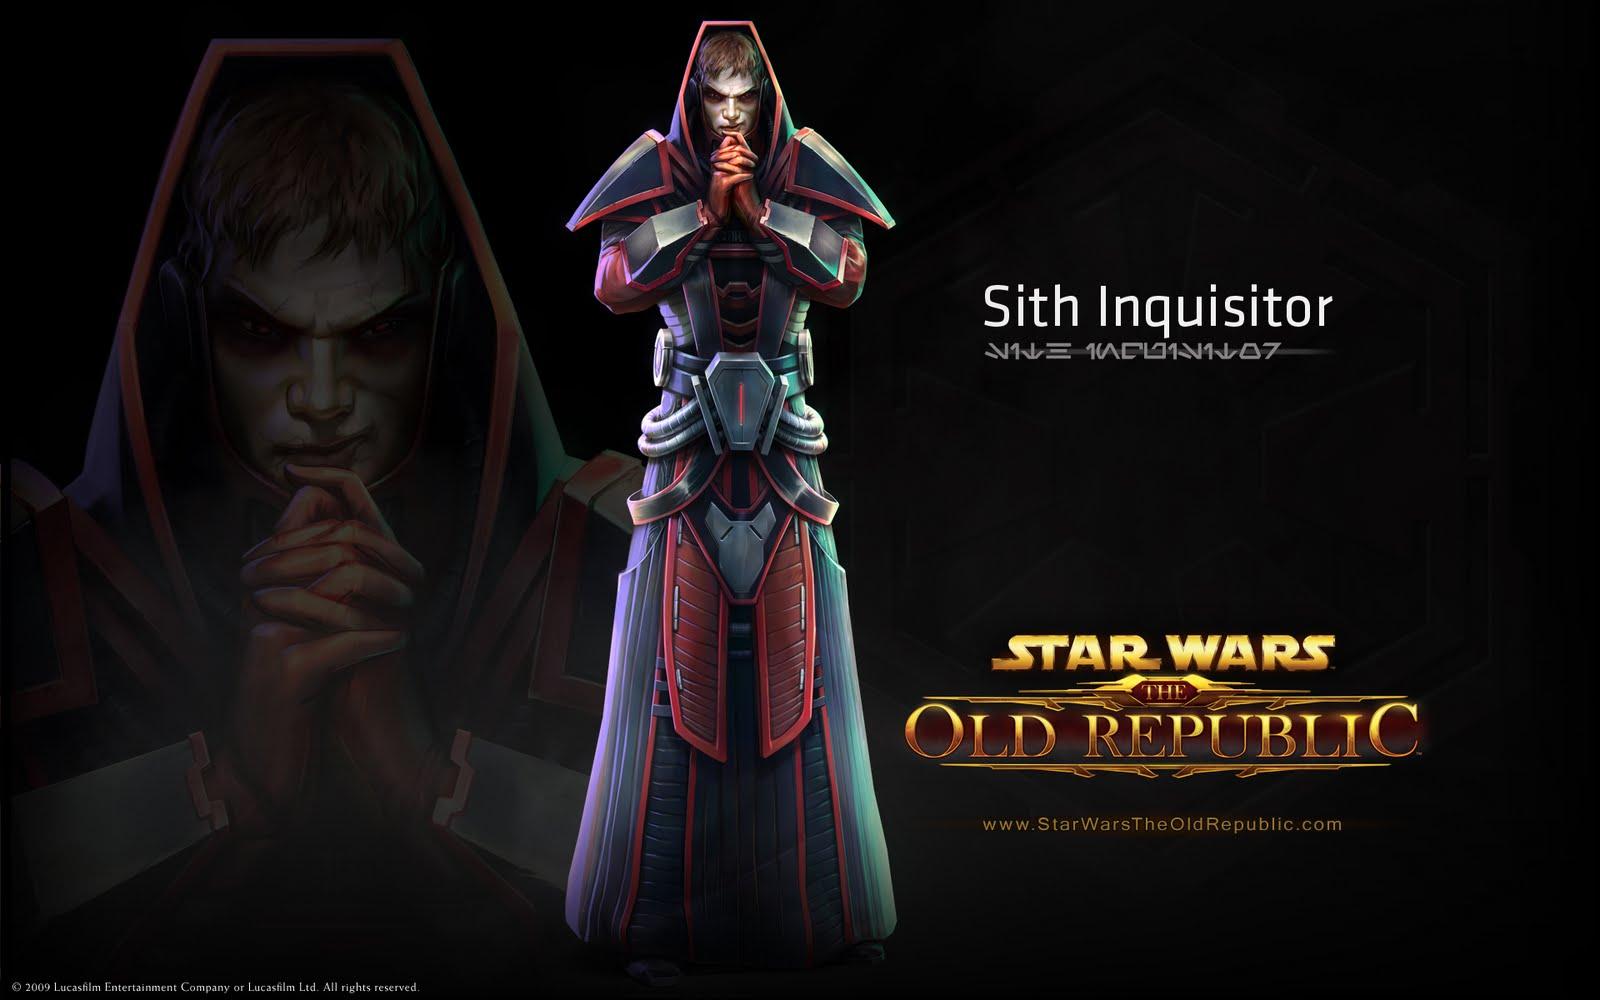 http://1.bp.blogspot.com/-WUs8aqJJ4Ug/TjGkAp3WbJI/AAAAAAAAYsY/tdsot-zluXM/s1600/Star+Wars+-+The+Old+Republic+Wallpapers+%252832%2529.jpg